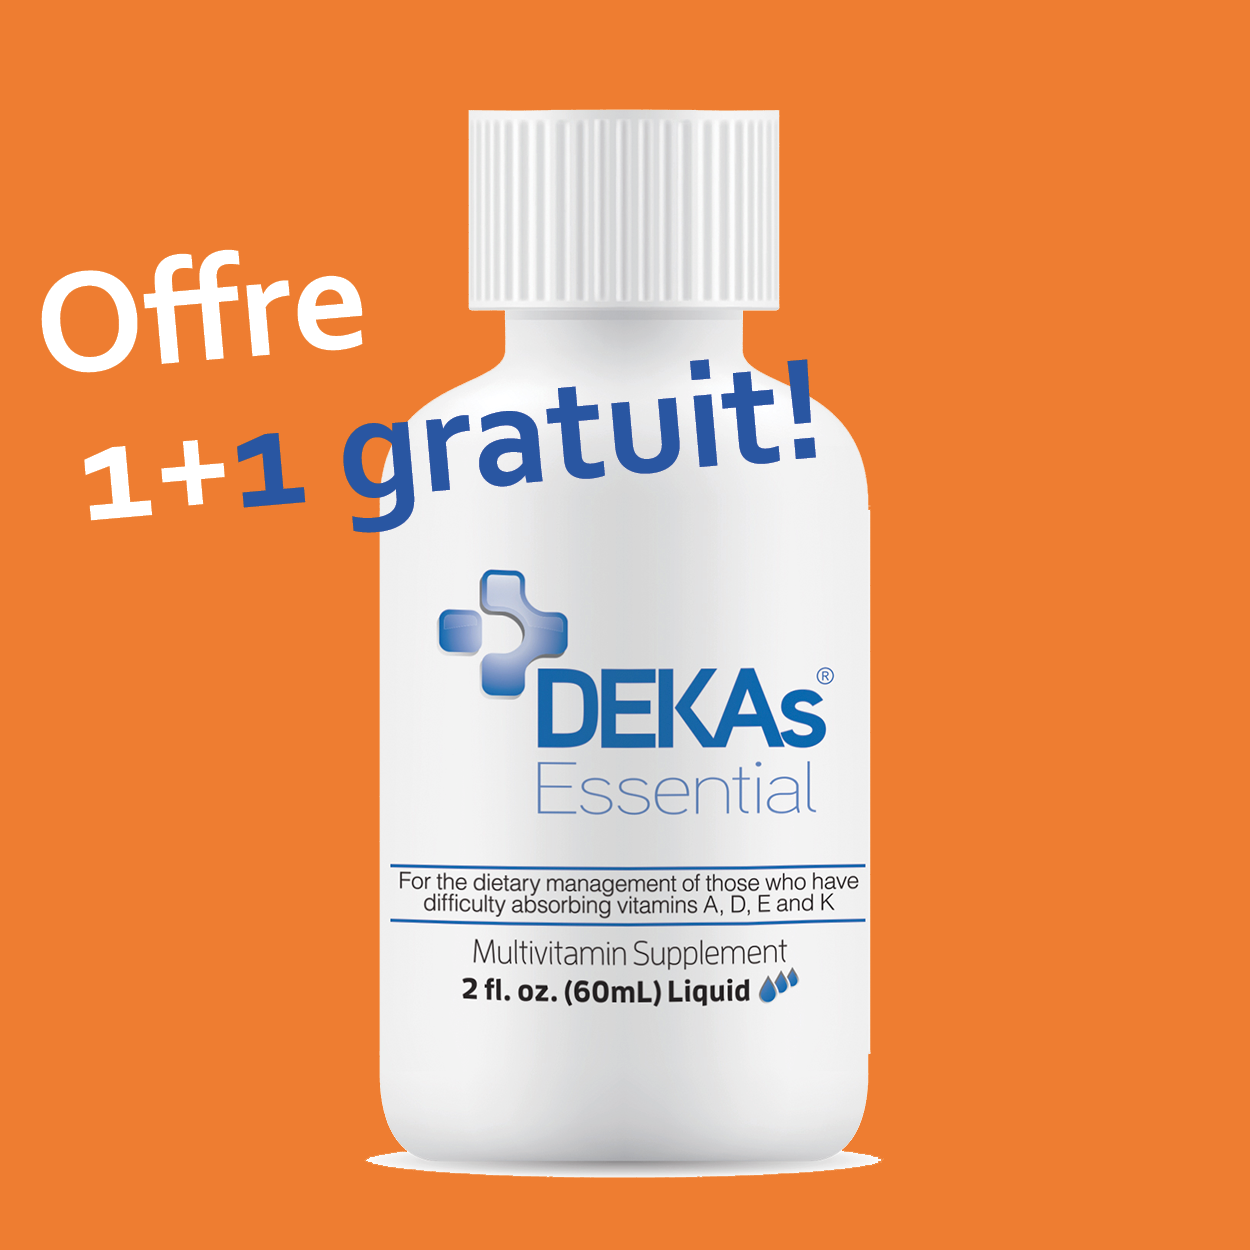 DEKAs Essential Liquid1+1 FRA